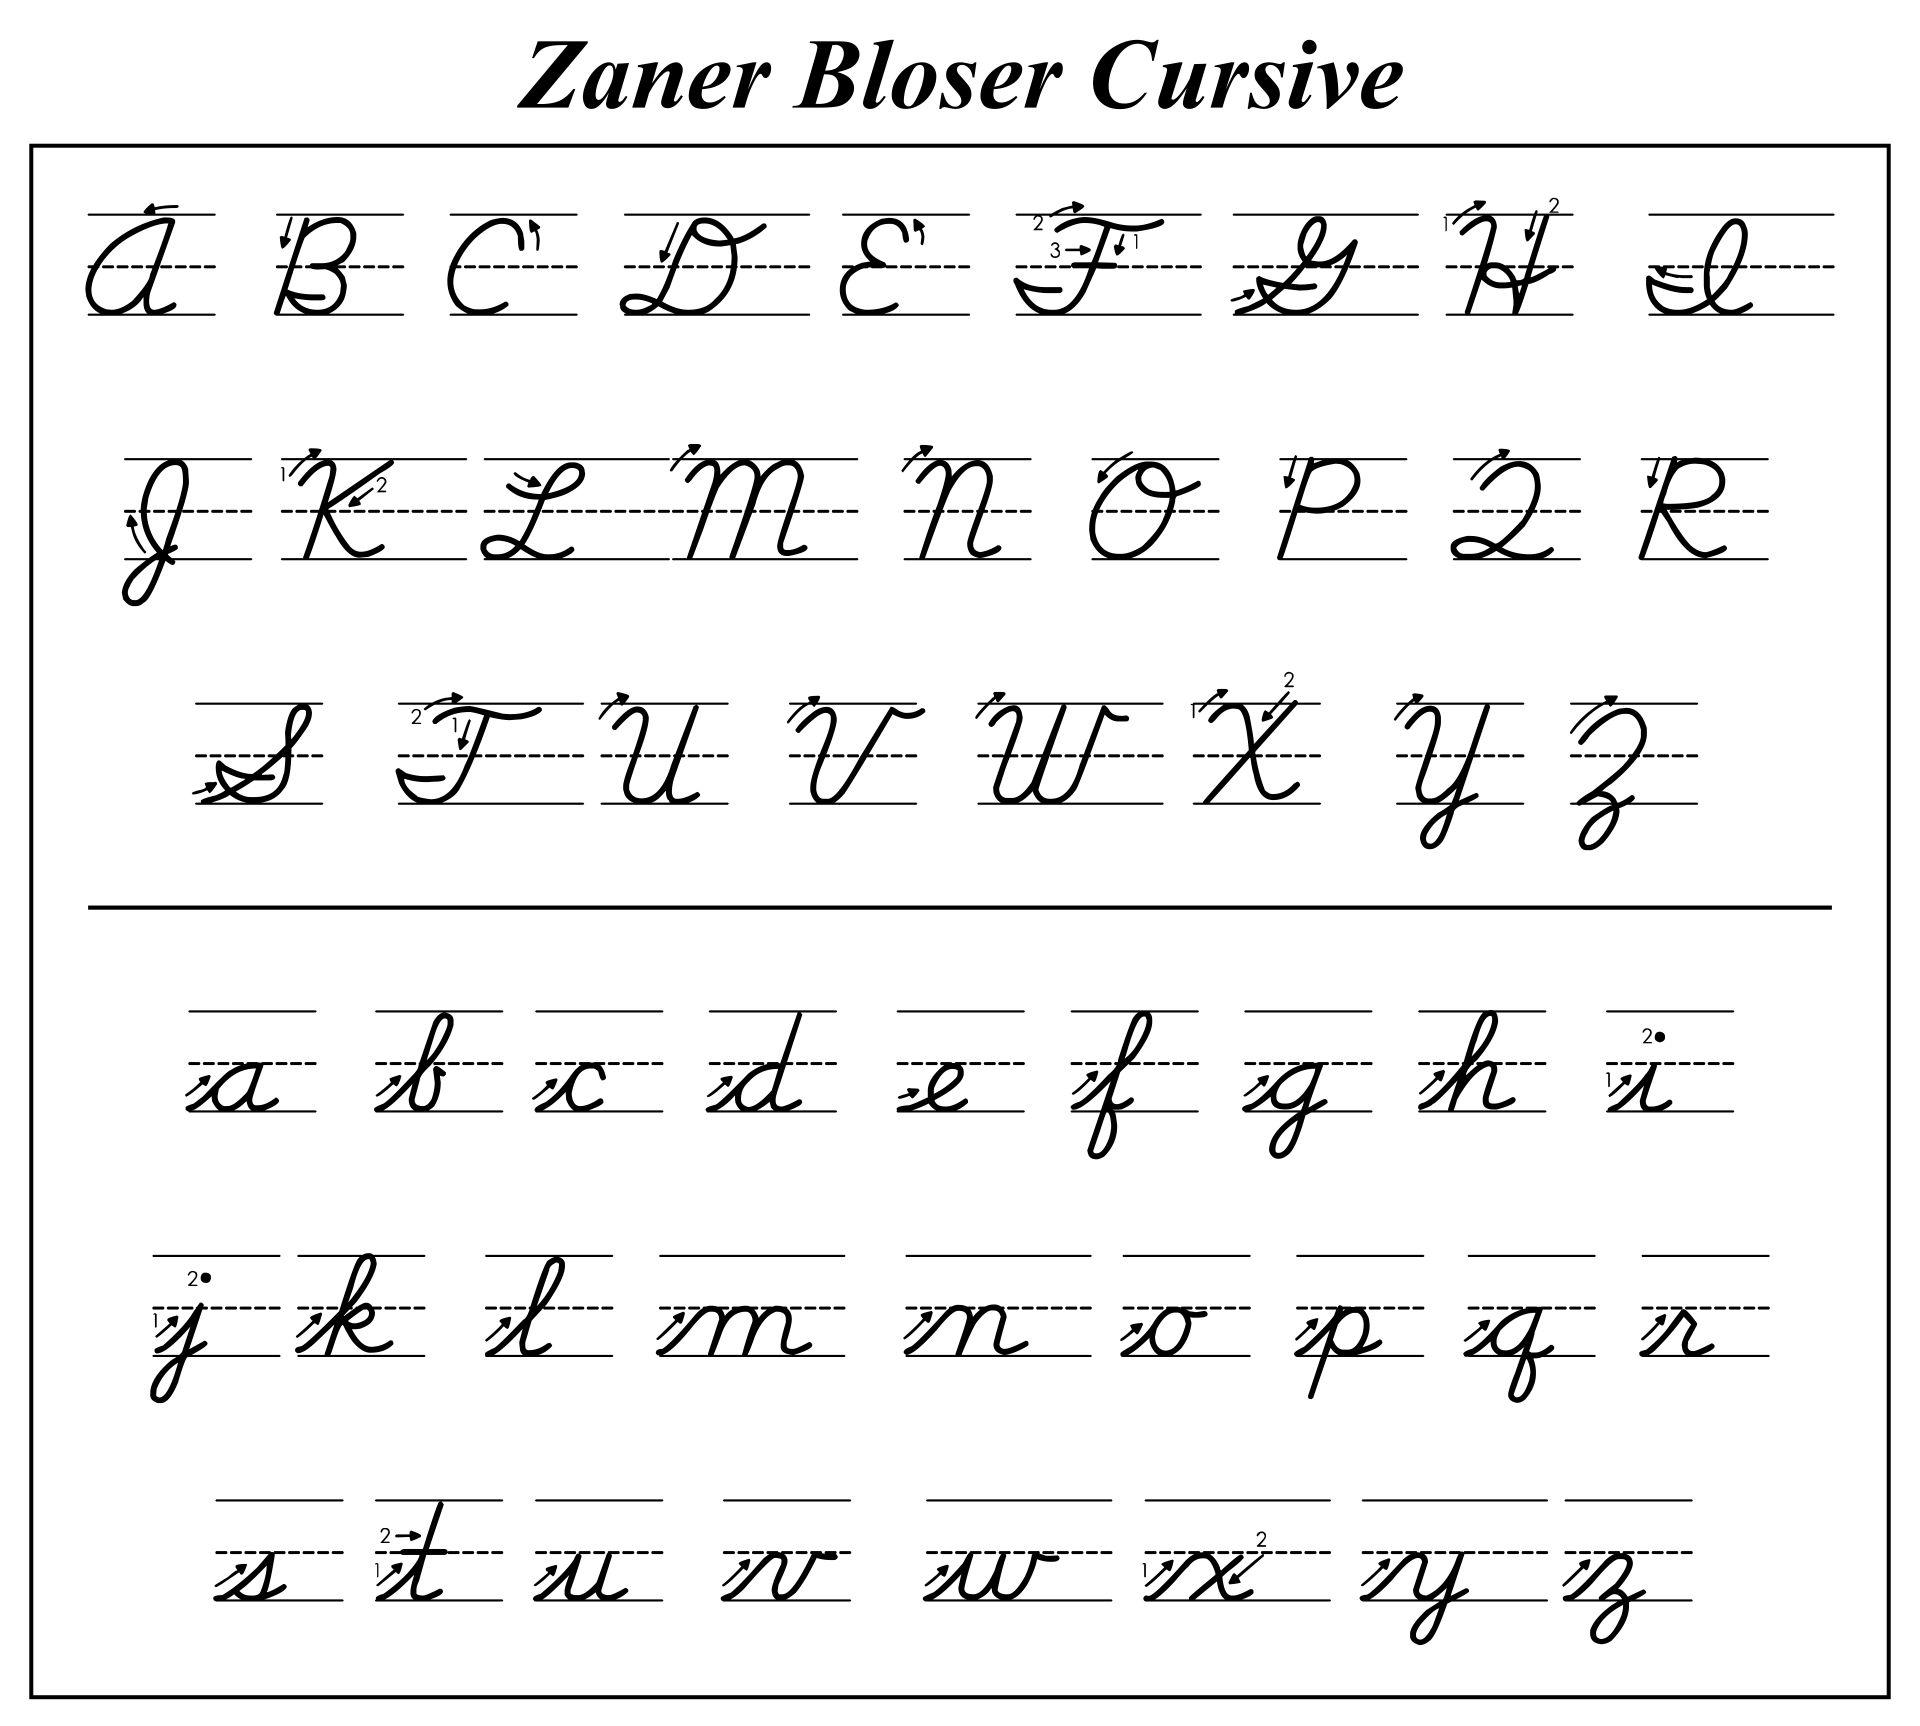 Zaner-Bloser Cursive Alphabet Printable